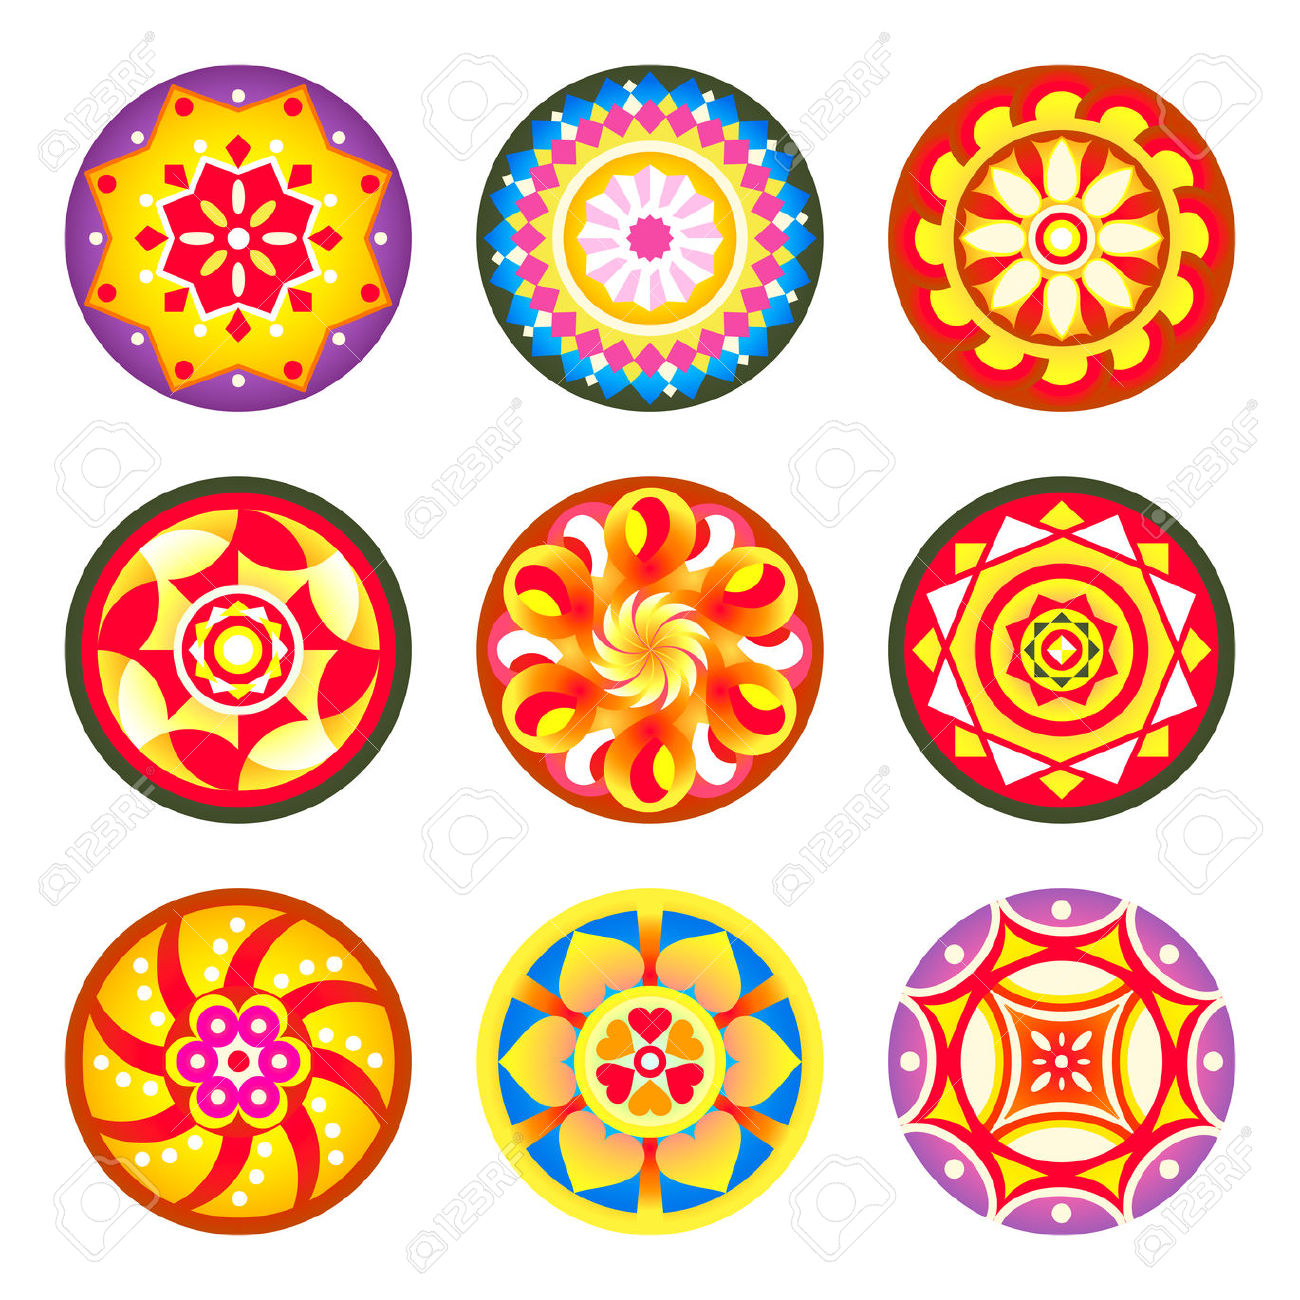 Indian Flower Carpet Patterns (pookalams) For Onam Festival.